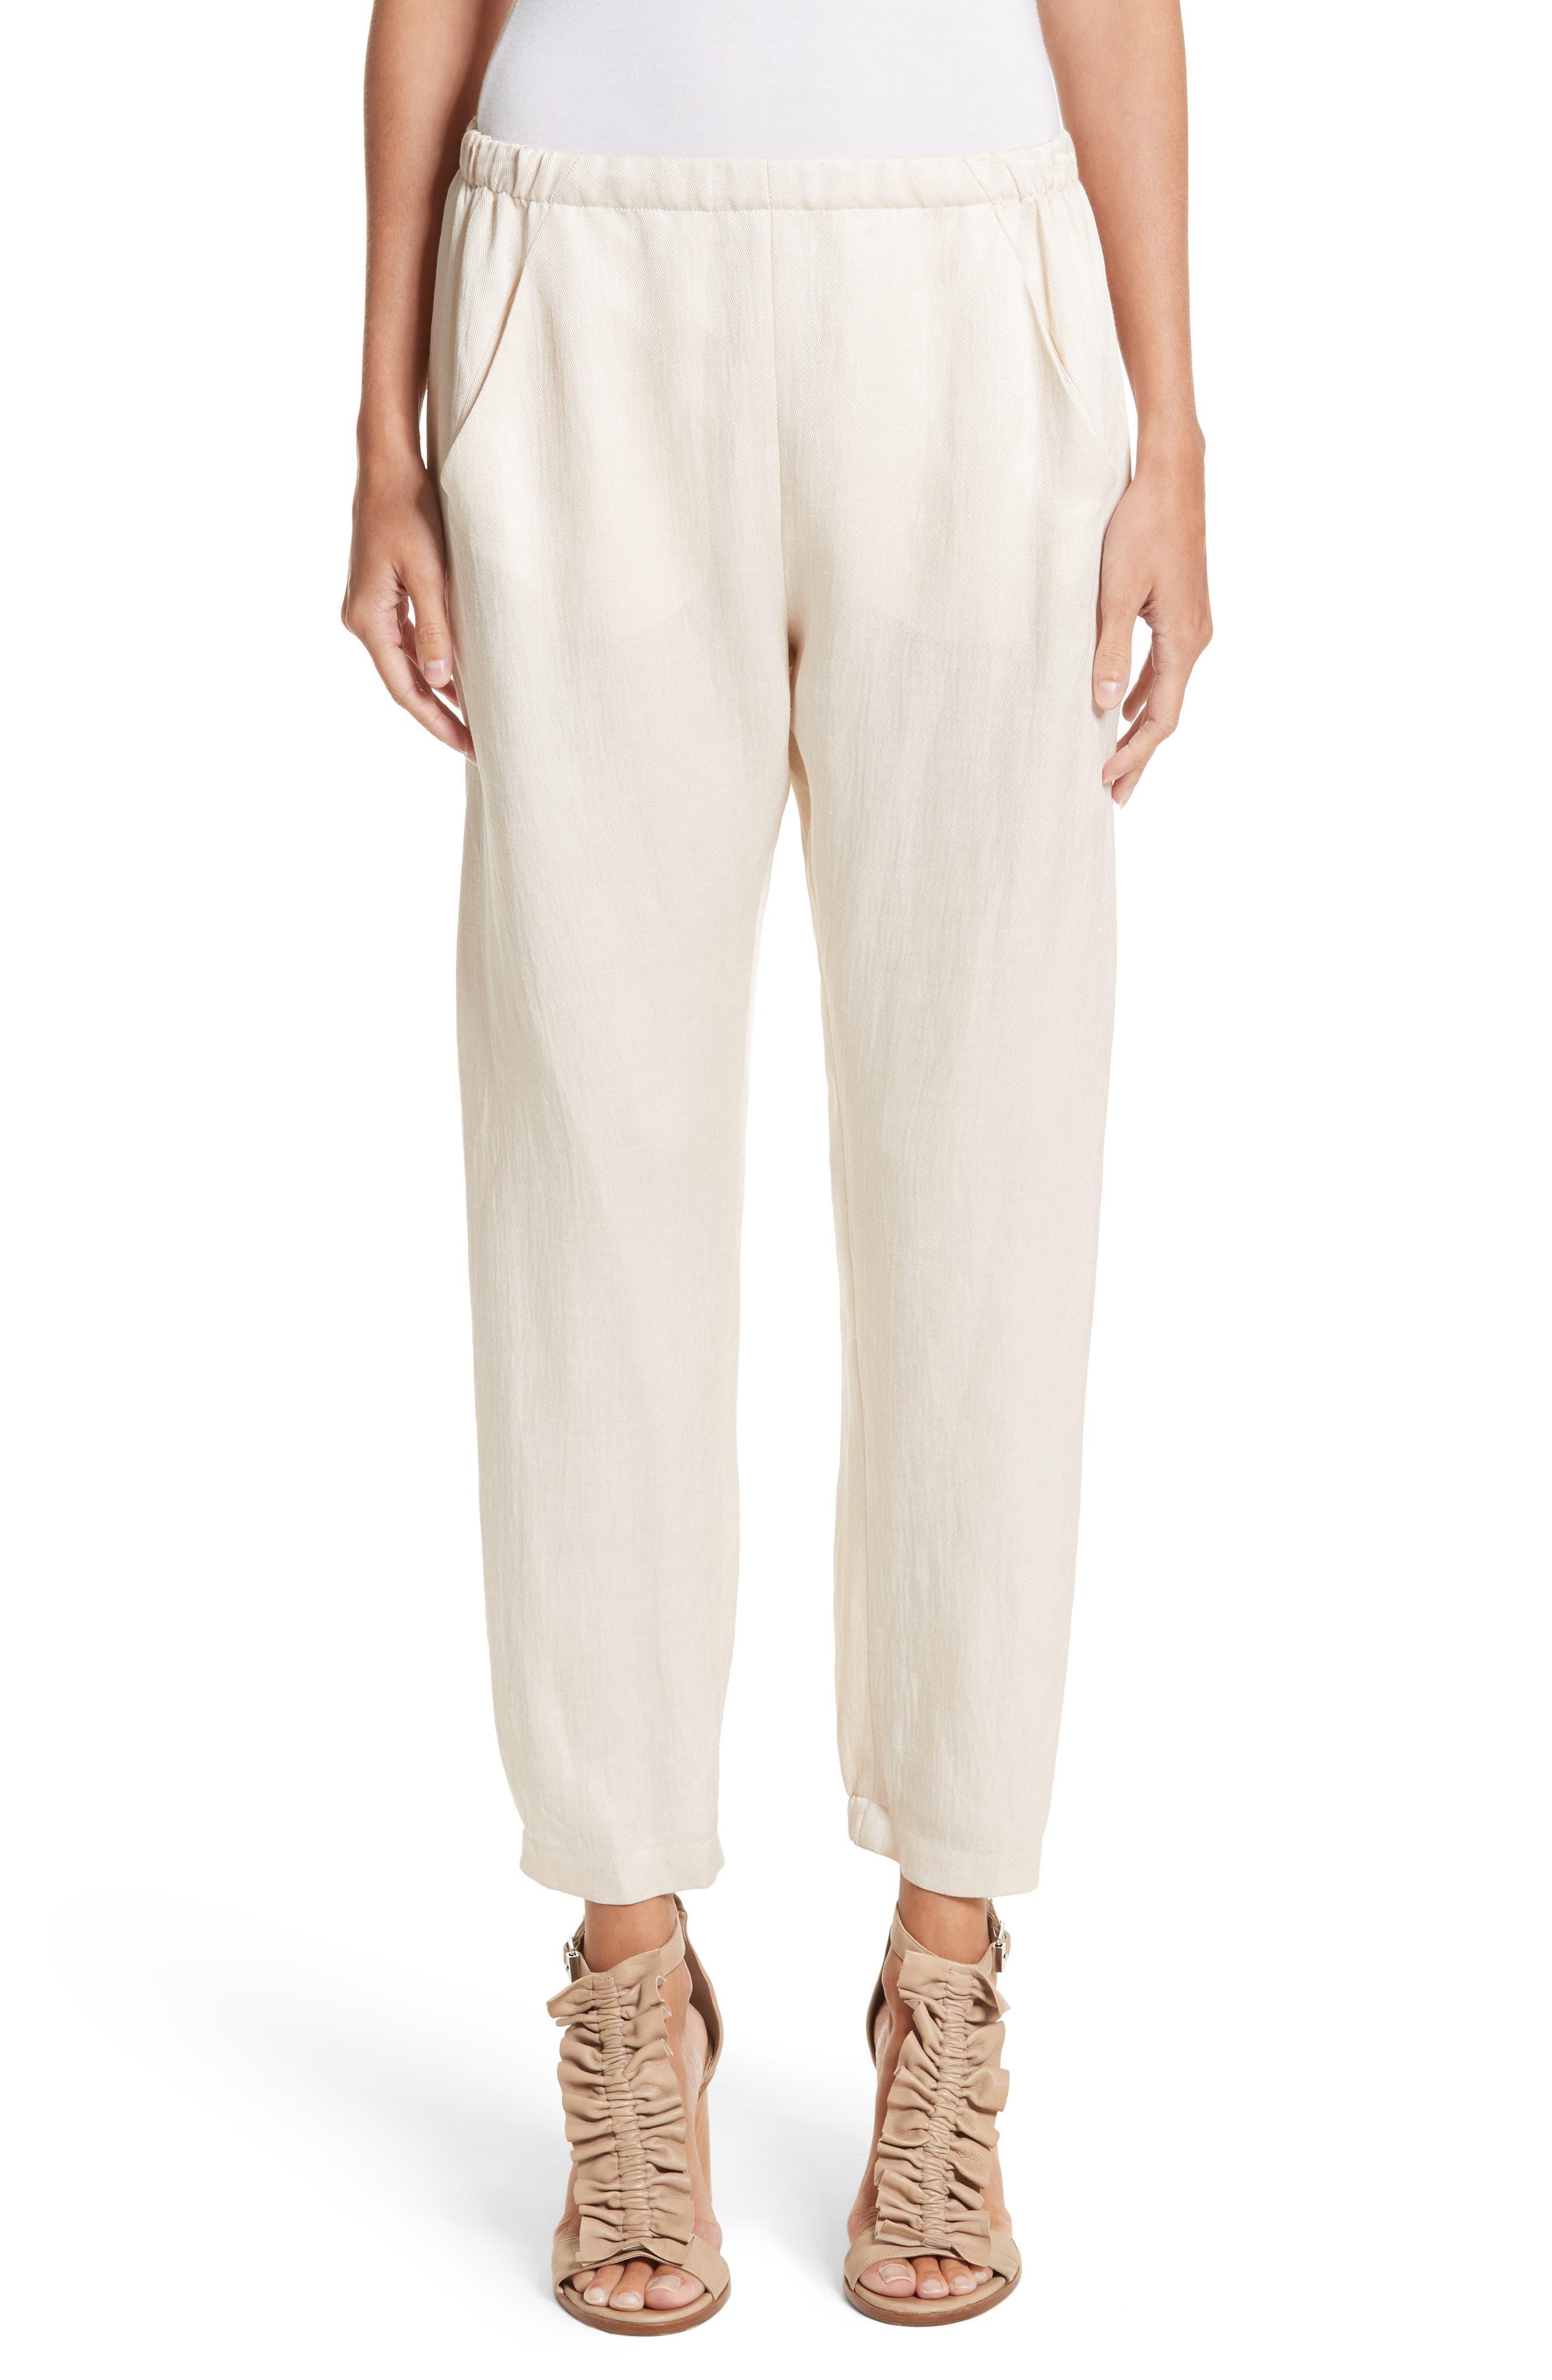 Alternate Image 1 Selected - Zero + Maria Cornejo Gabi Eco Drape Pants